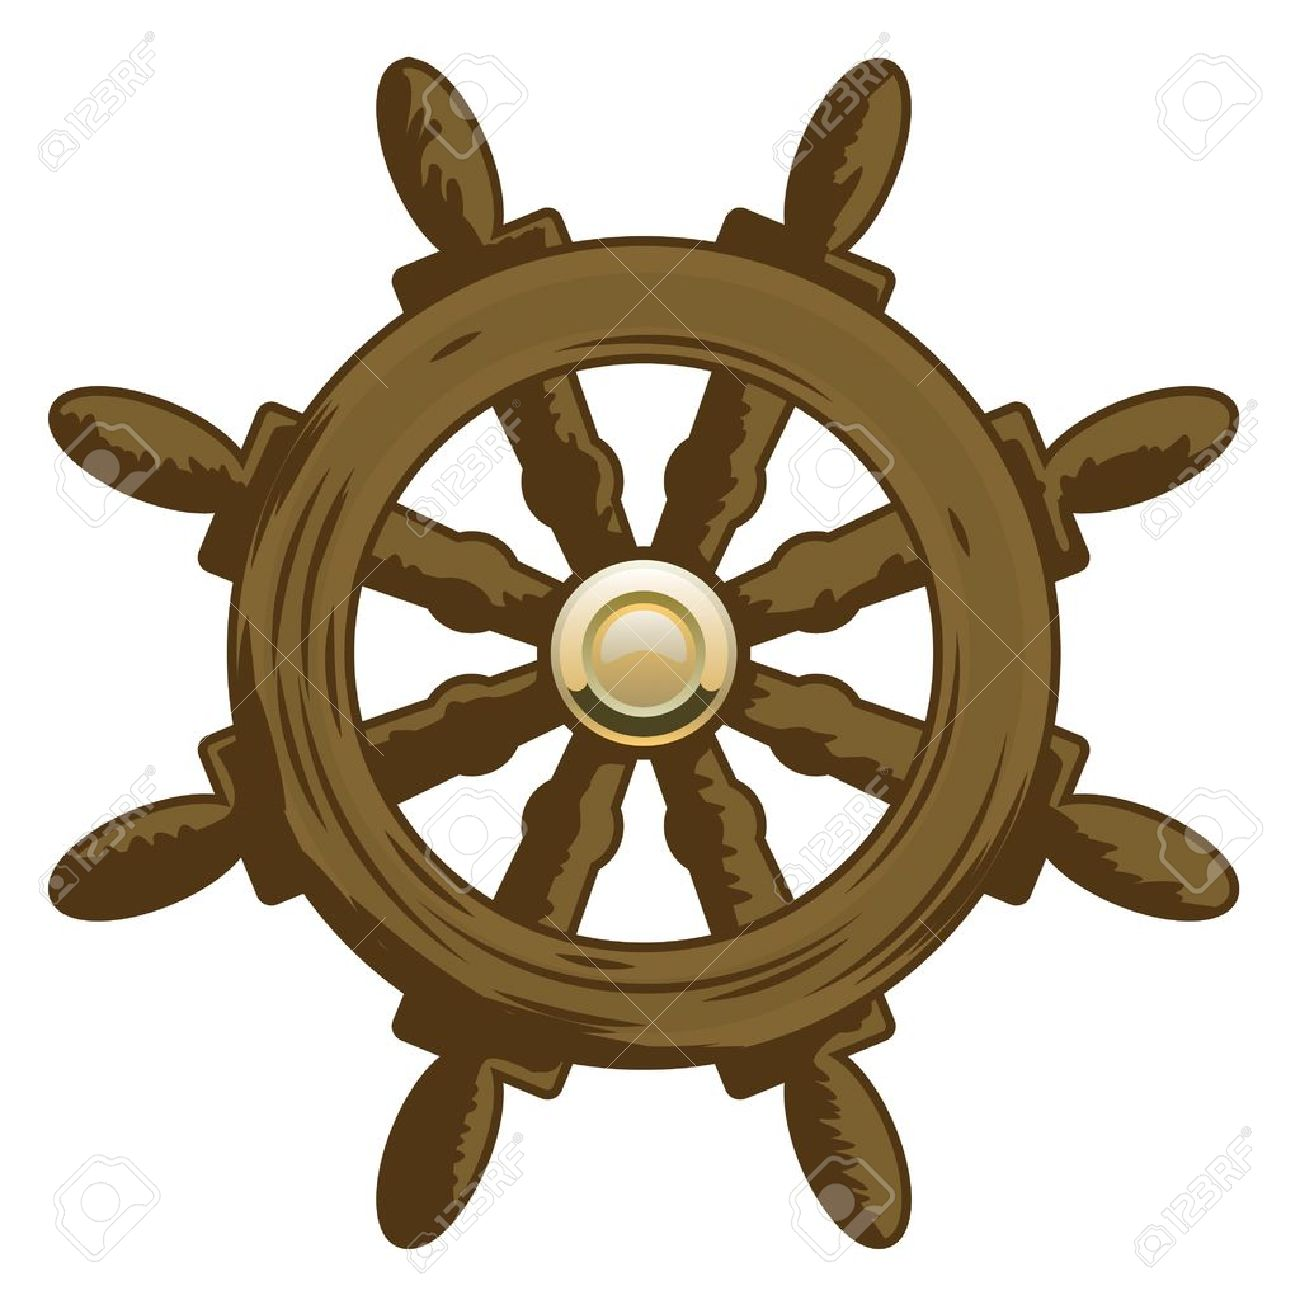 1300x1300 Ship Clipart Ship Steering Wheel